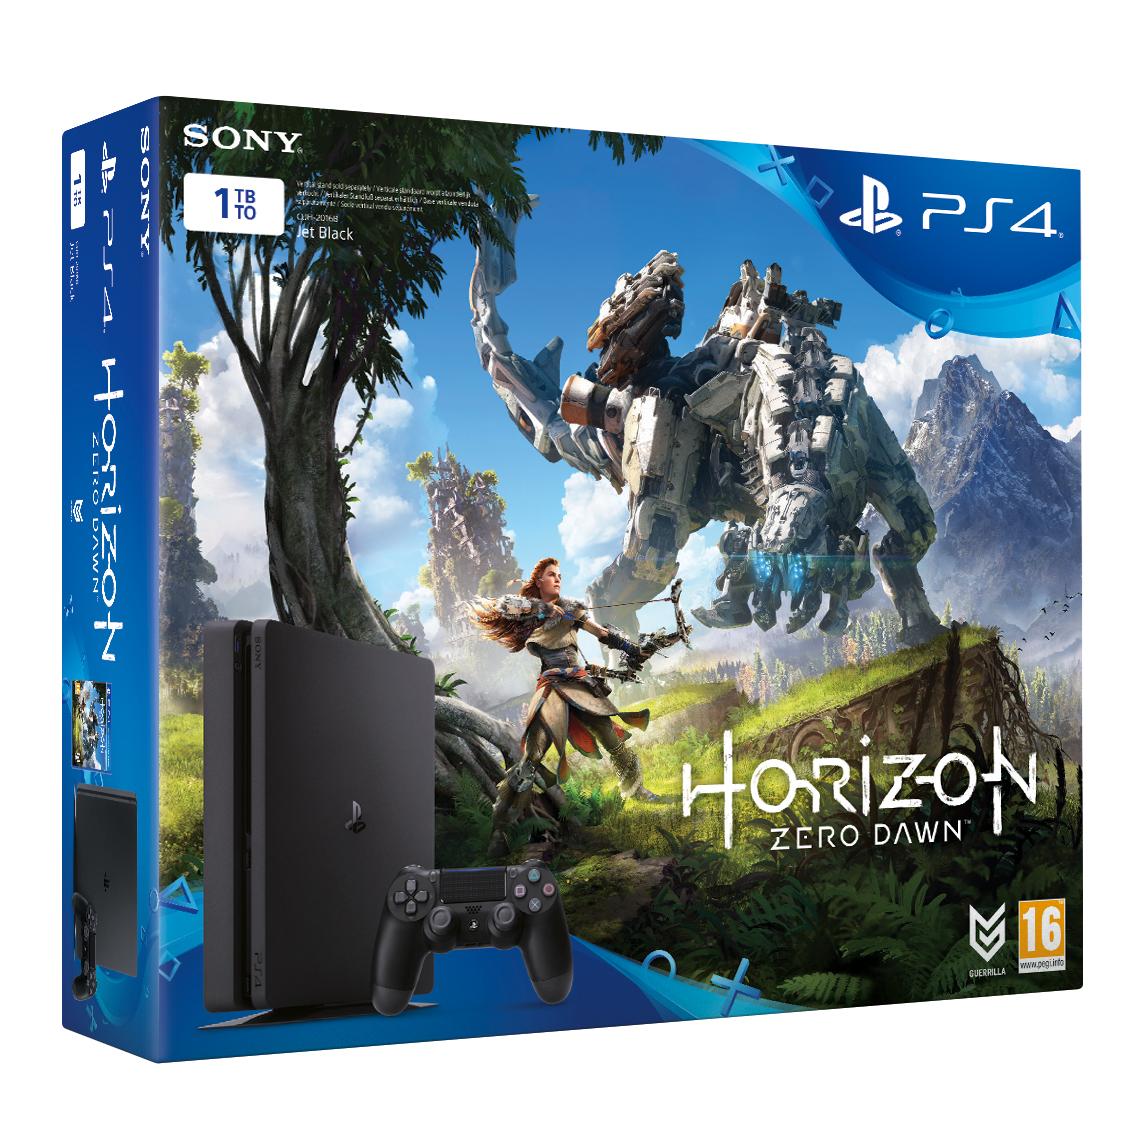 sony announces horizon zero dawn playstation 4 bundle for. Black Bedroom Furniture Sets. Home Design Ideas